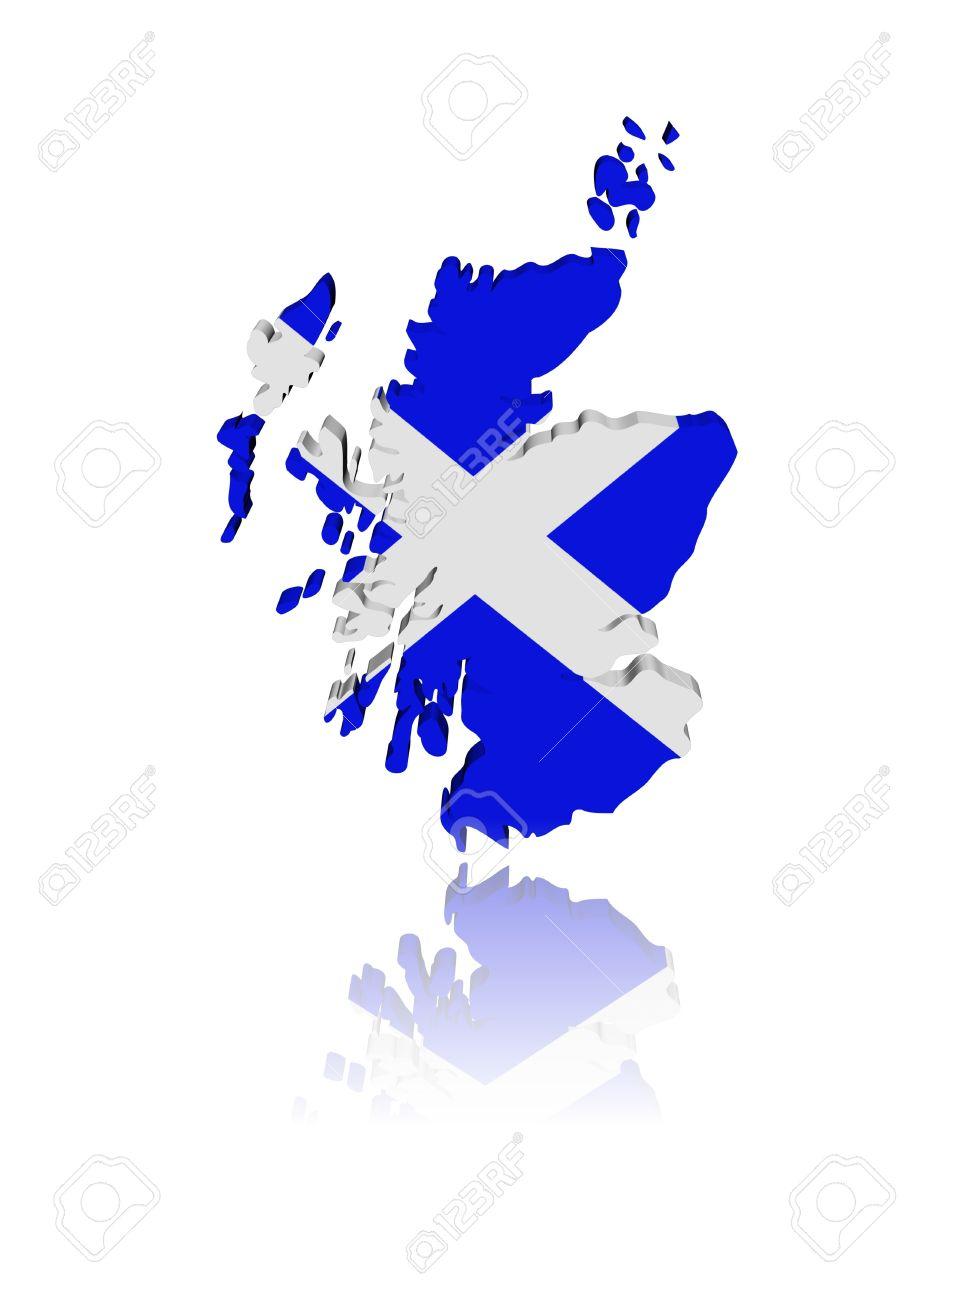 Stock Illustration on scotland x france, scotland map outline, island of islay scotland map, scotland map google, scotland county map, scotland shortbread recipe, scotland beach, scotland name map, scotland community, scotland on map, scotland map large, scotland lion, scotland travel map, silhouette scotland map, scotland football map, scotland tattoo, scotland road map,